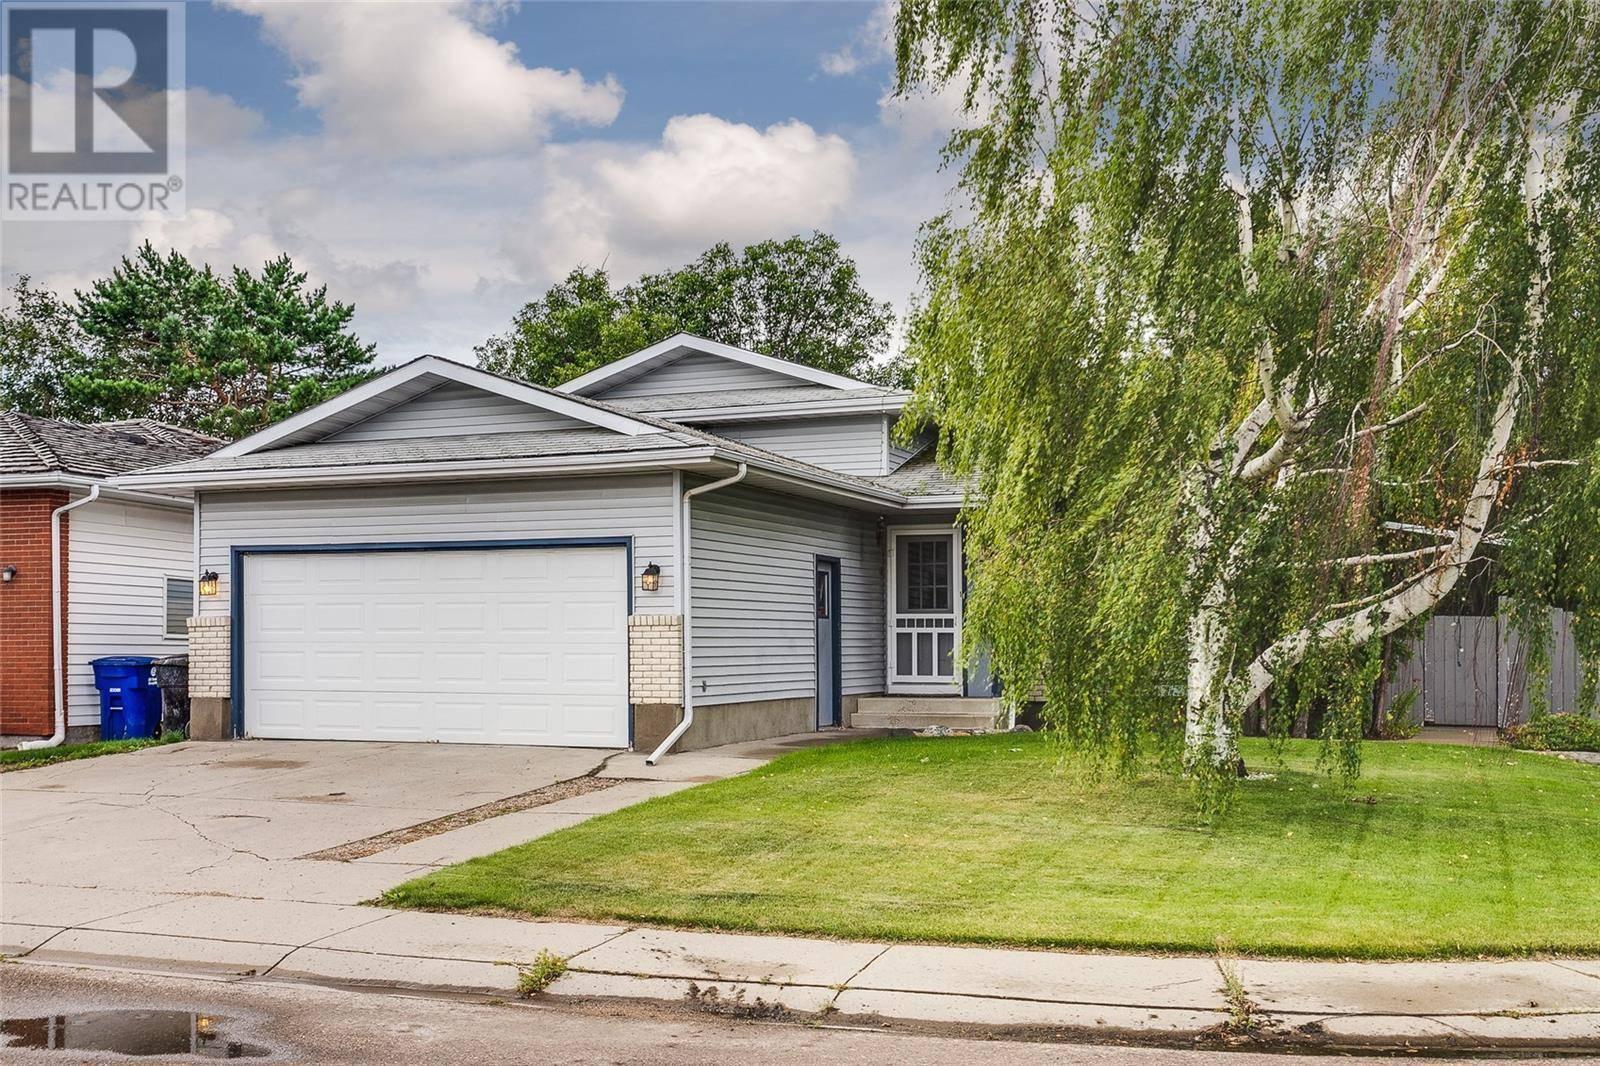 House for sale at 631 Wilkinson Pl Saskatoon Saskatchewan - MLS: SK782788